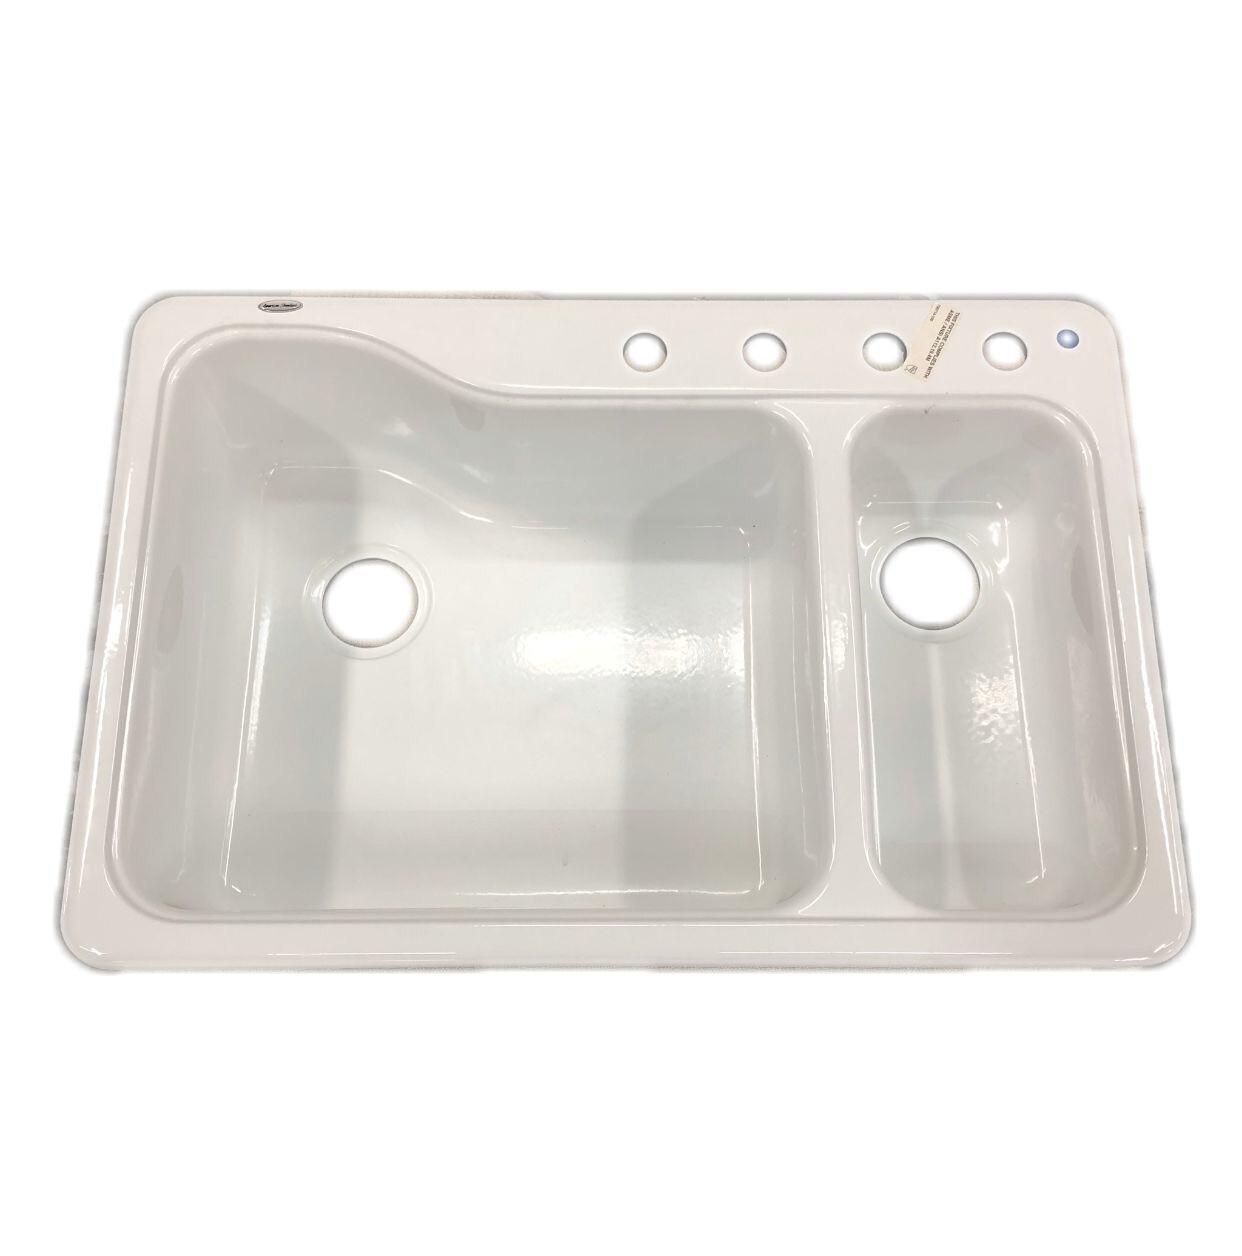 "American Standard Silhouette Dual Level 33"" x 22"" Drop-in Kitchen Sink"